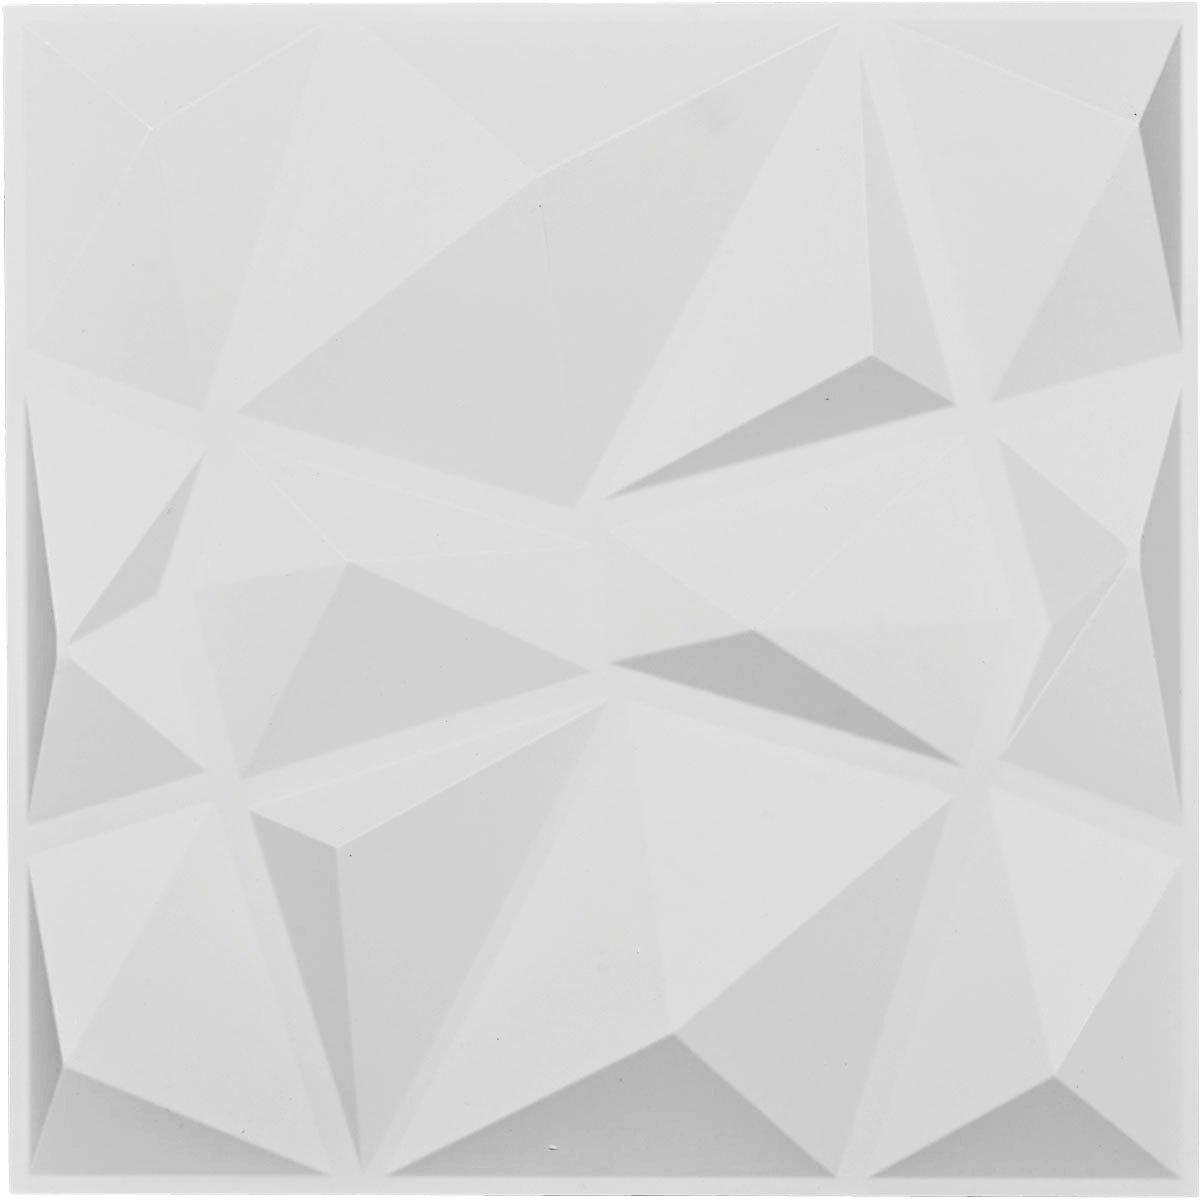 Ekena Millwork WP20X20NIWH 19 5/8''W x 19 5/8''H Niobe EnduraWall Decorative 3D Wall Panel, White